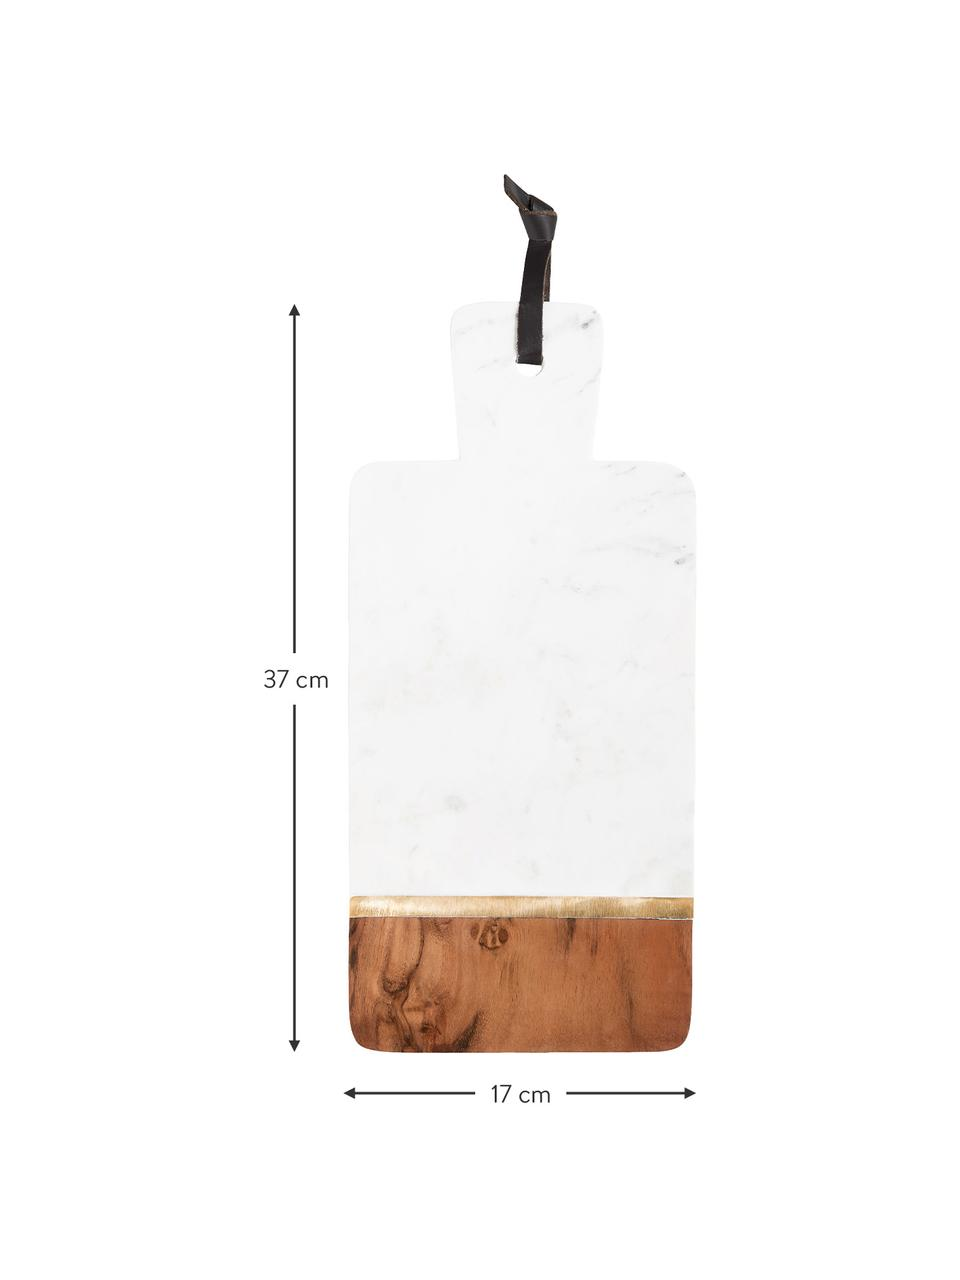 Marmor-Schneidebrett Luxory Kitchen, L 37 x B 17 cm, Marmor, Akazienholz, Messing, Weiß, Akazienholz, Messing, 17 x 37 cm